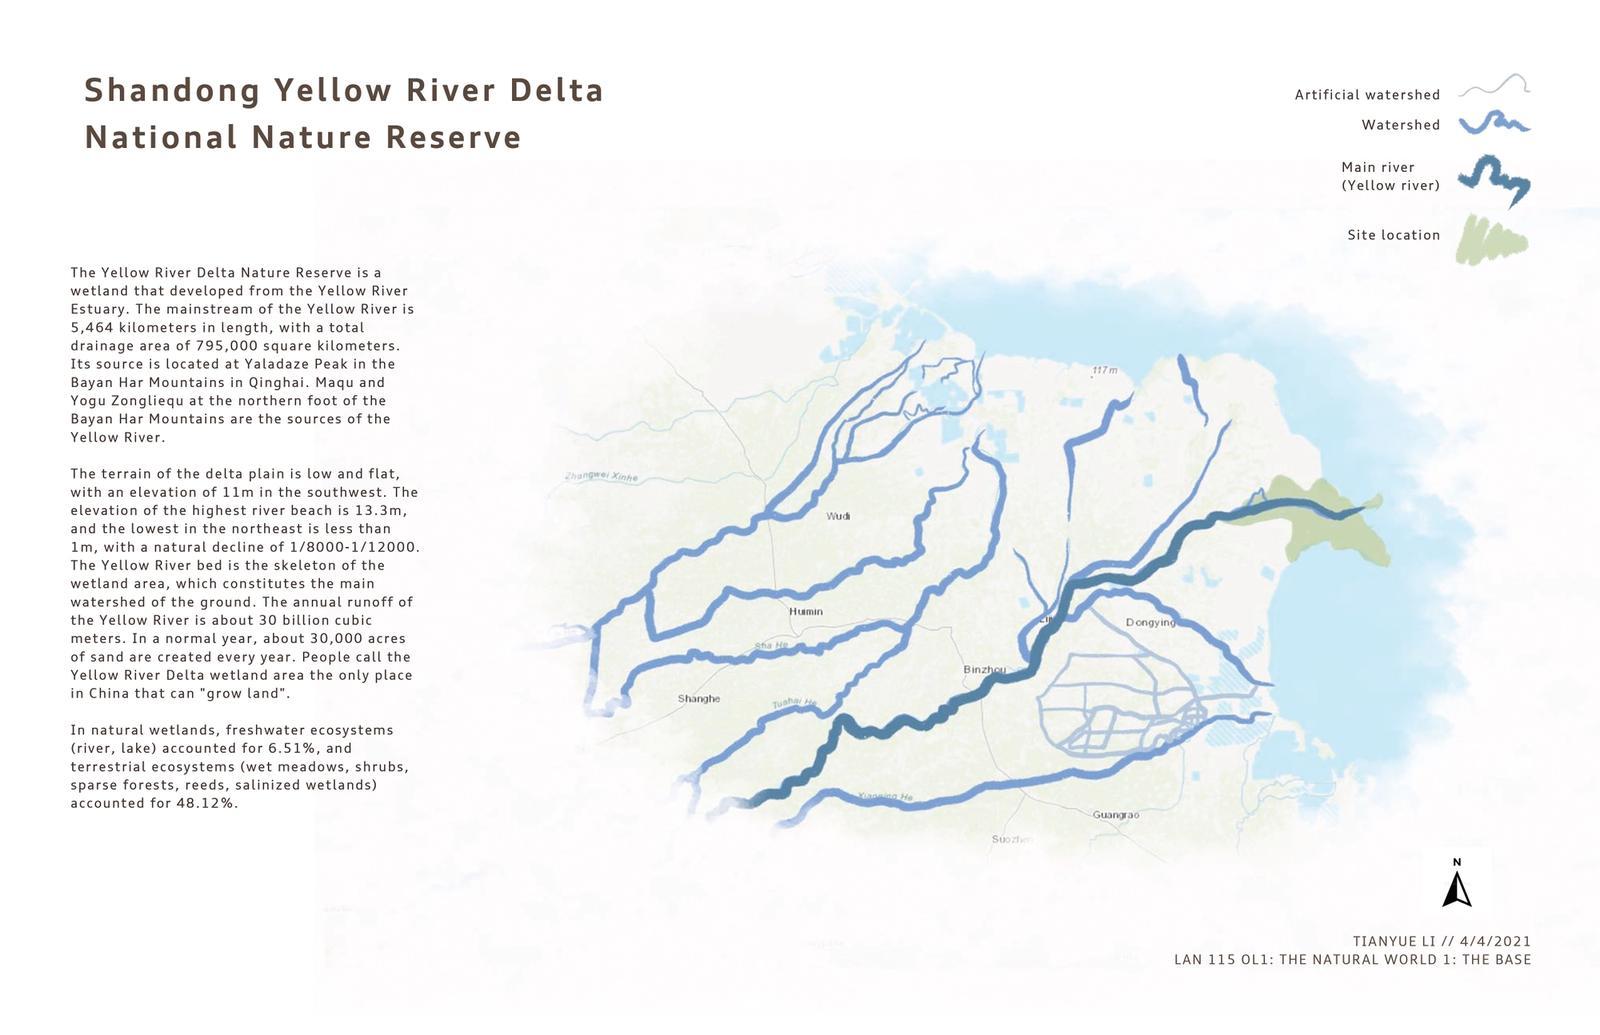 Shandong Yellow River Delta National Nature Reserve